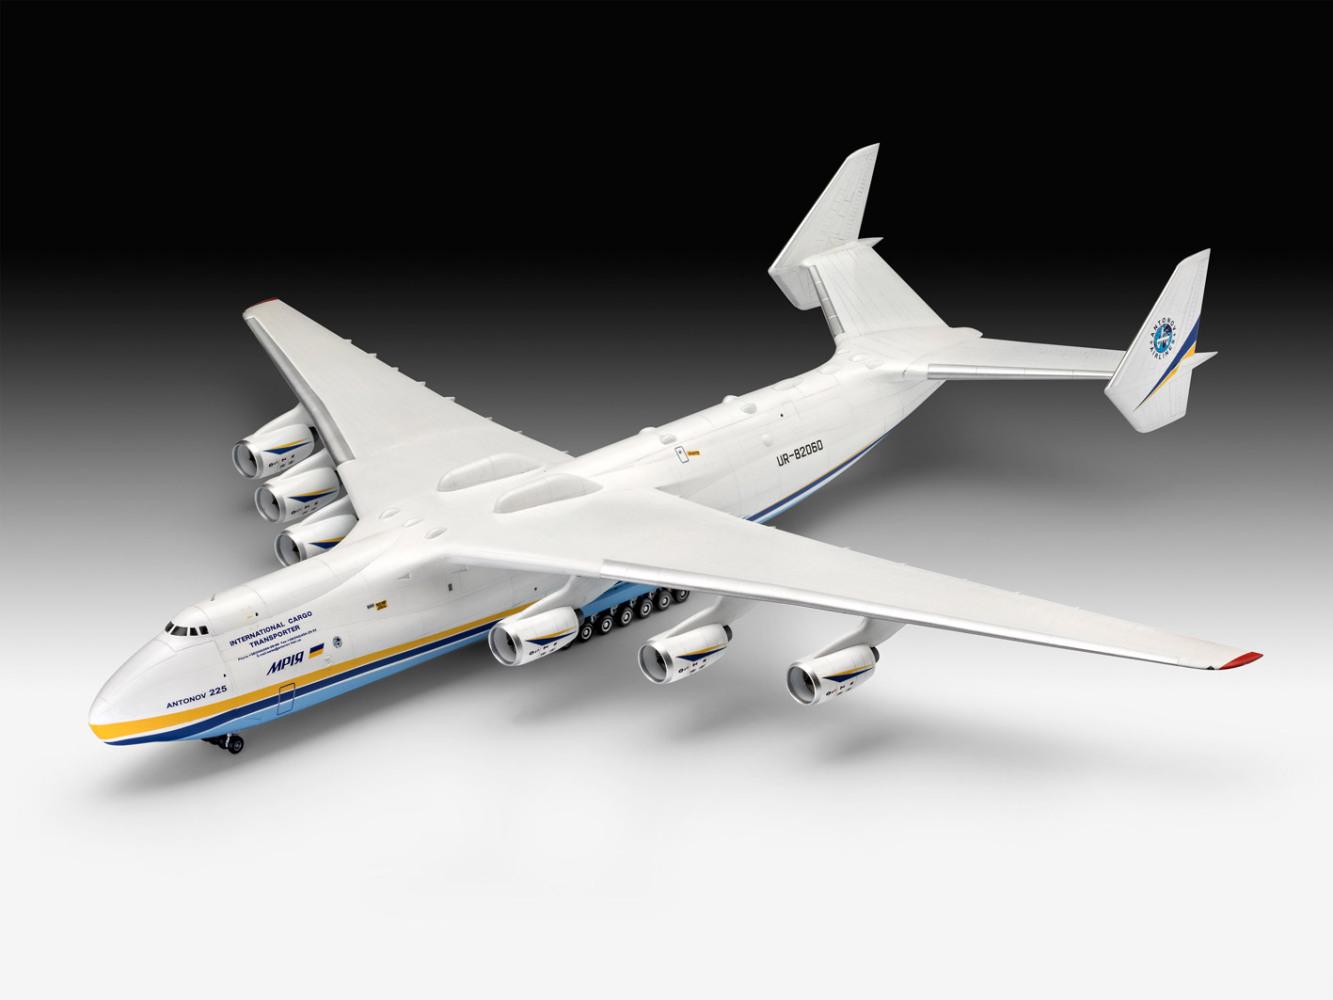 Aircraft - Models And Hobbies 4U | Australia's Friendliest